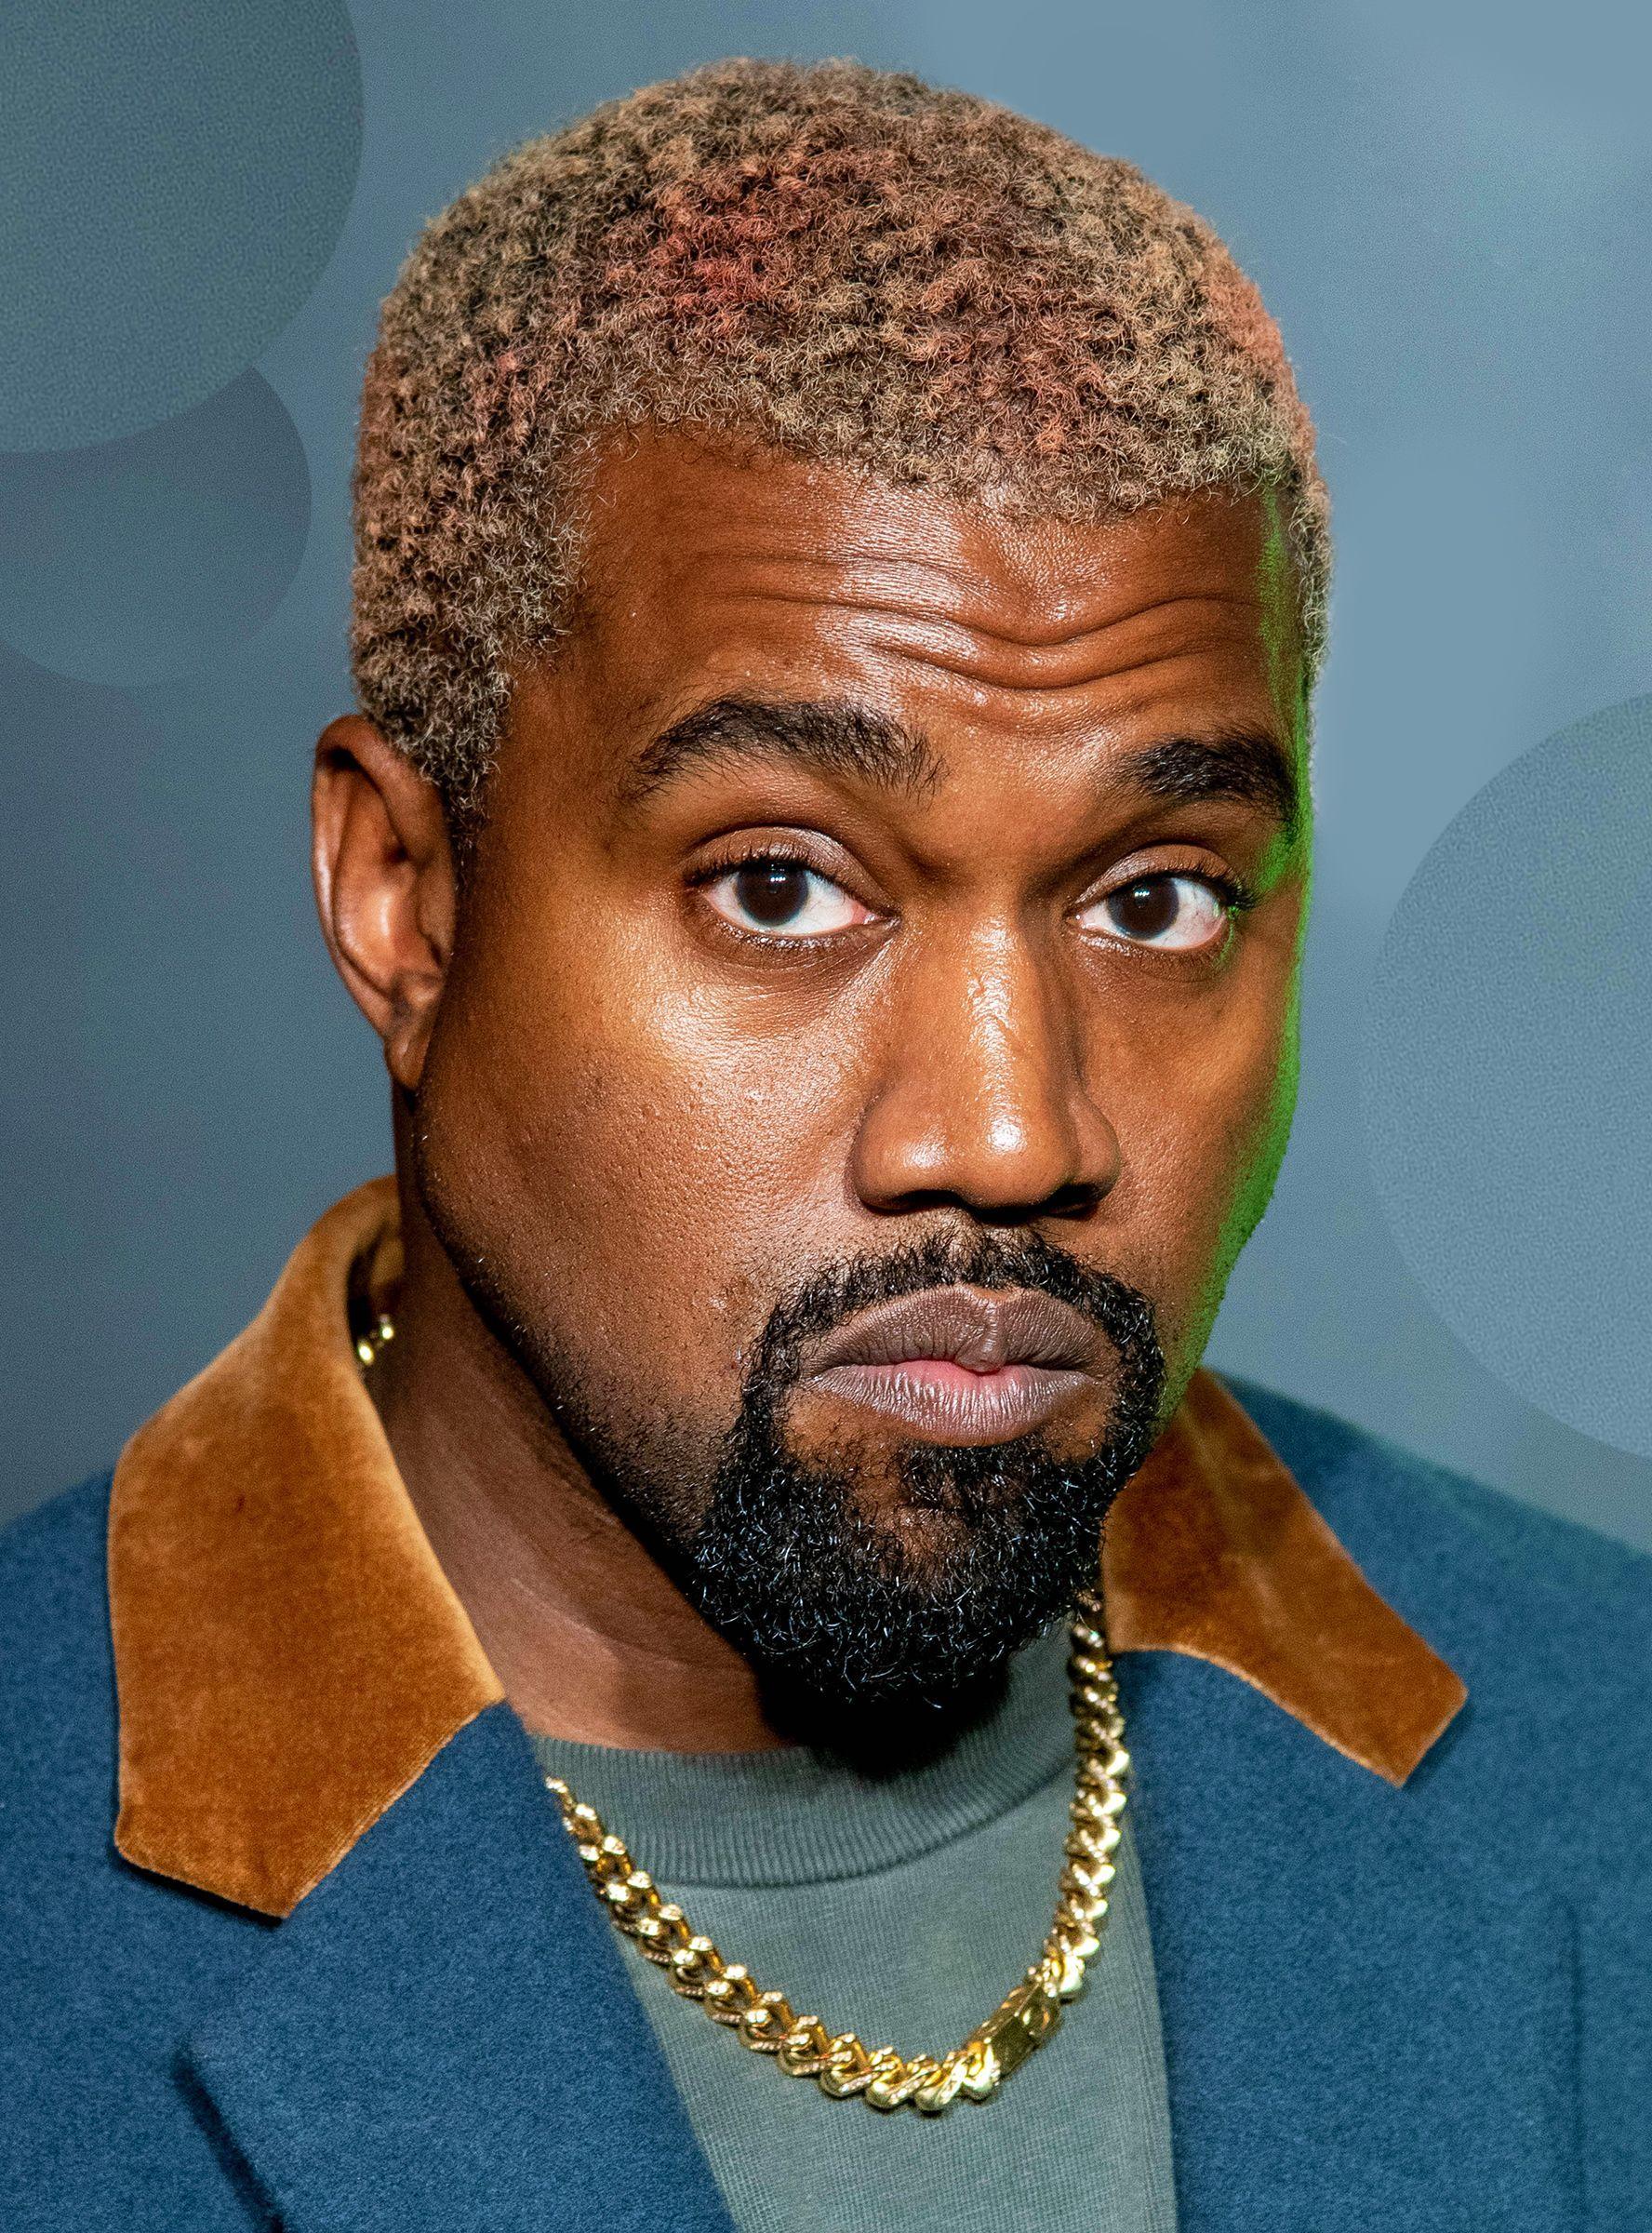 Kanye West S New Hairstyle Has Split The Internet Boys Colored Hair Luke Evans Boyfriend Kanye West Hair